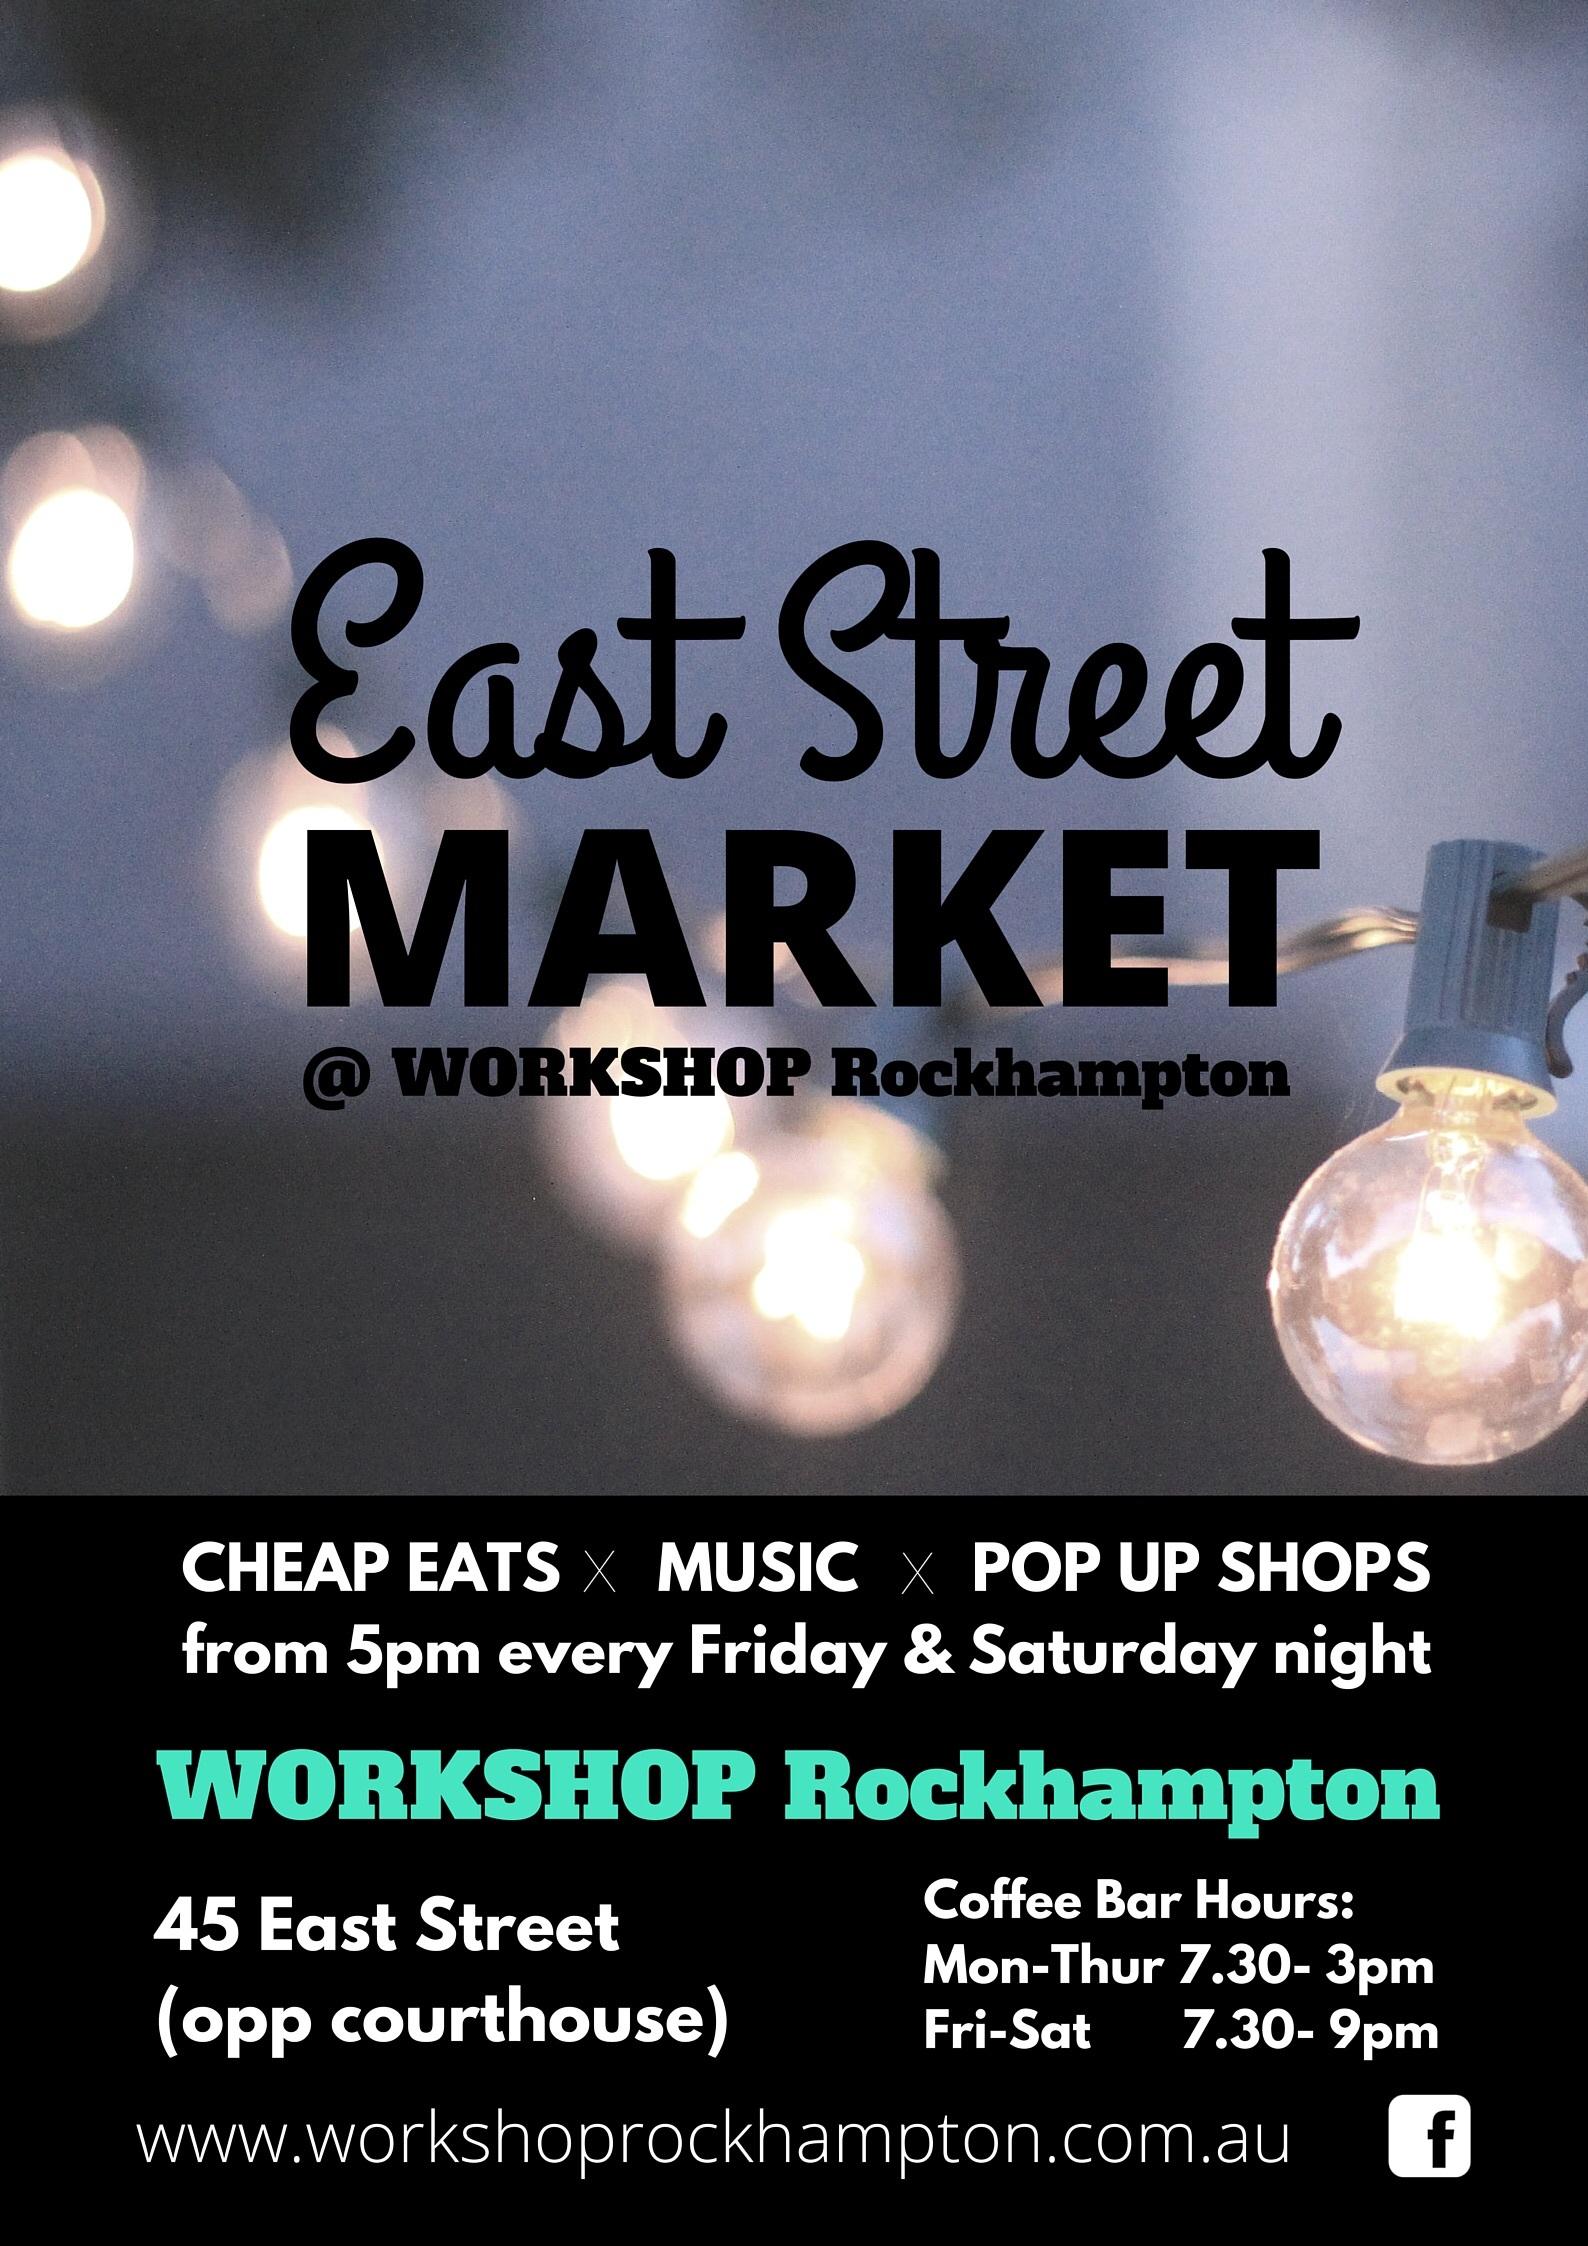 Workshop Rockhampton seeks investors!